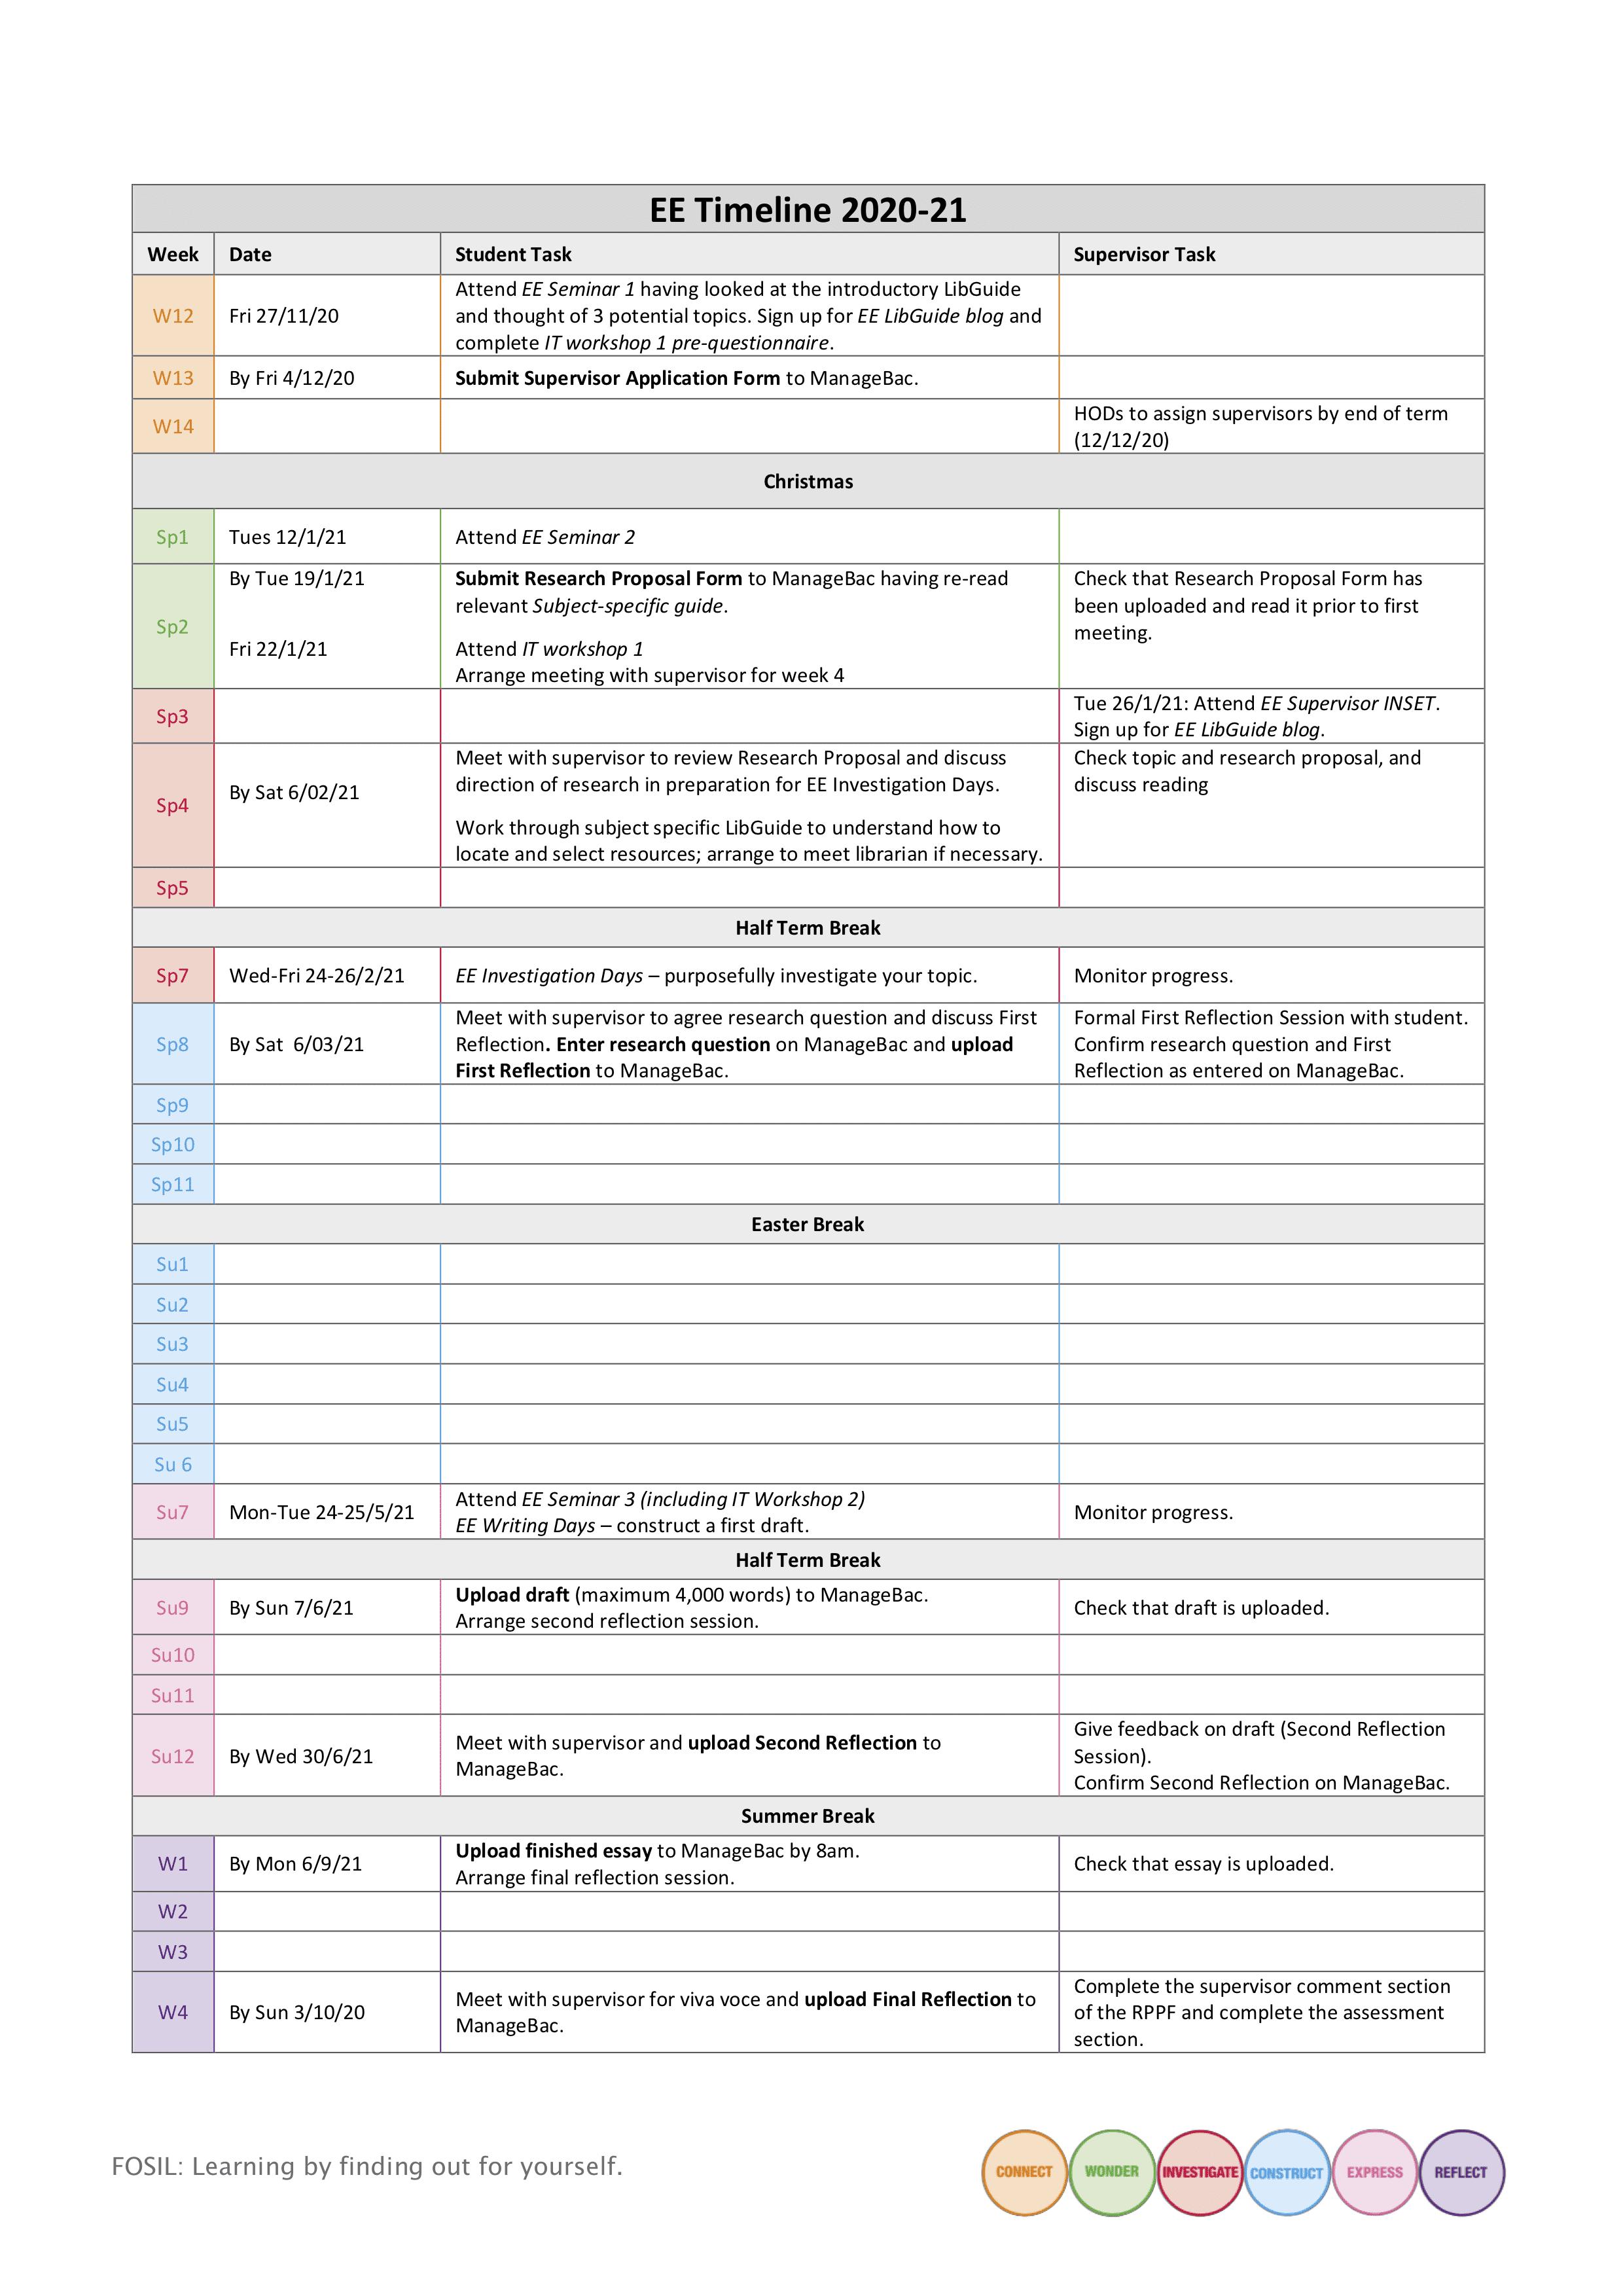 EE timetable 2020-21